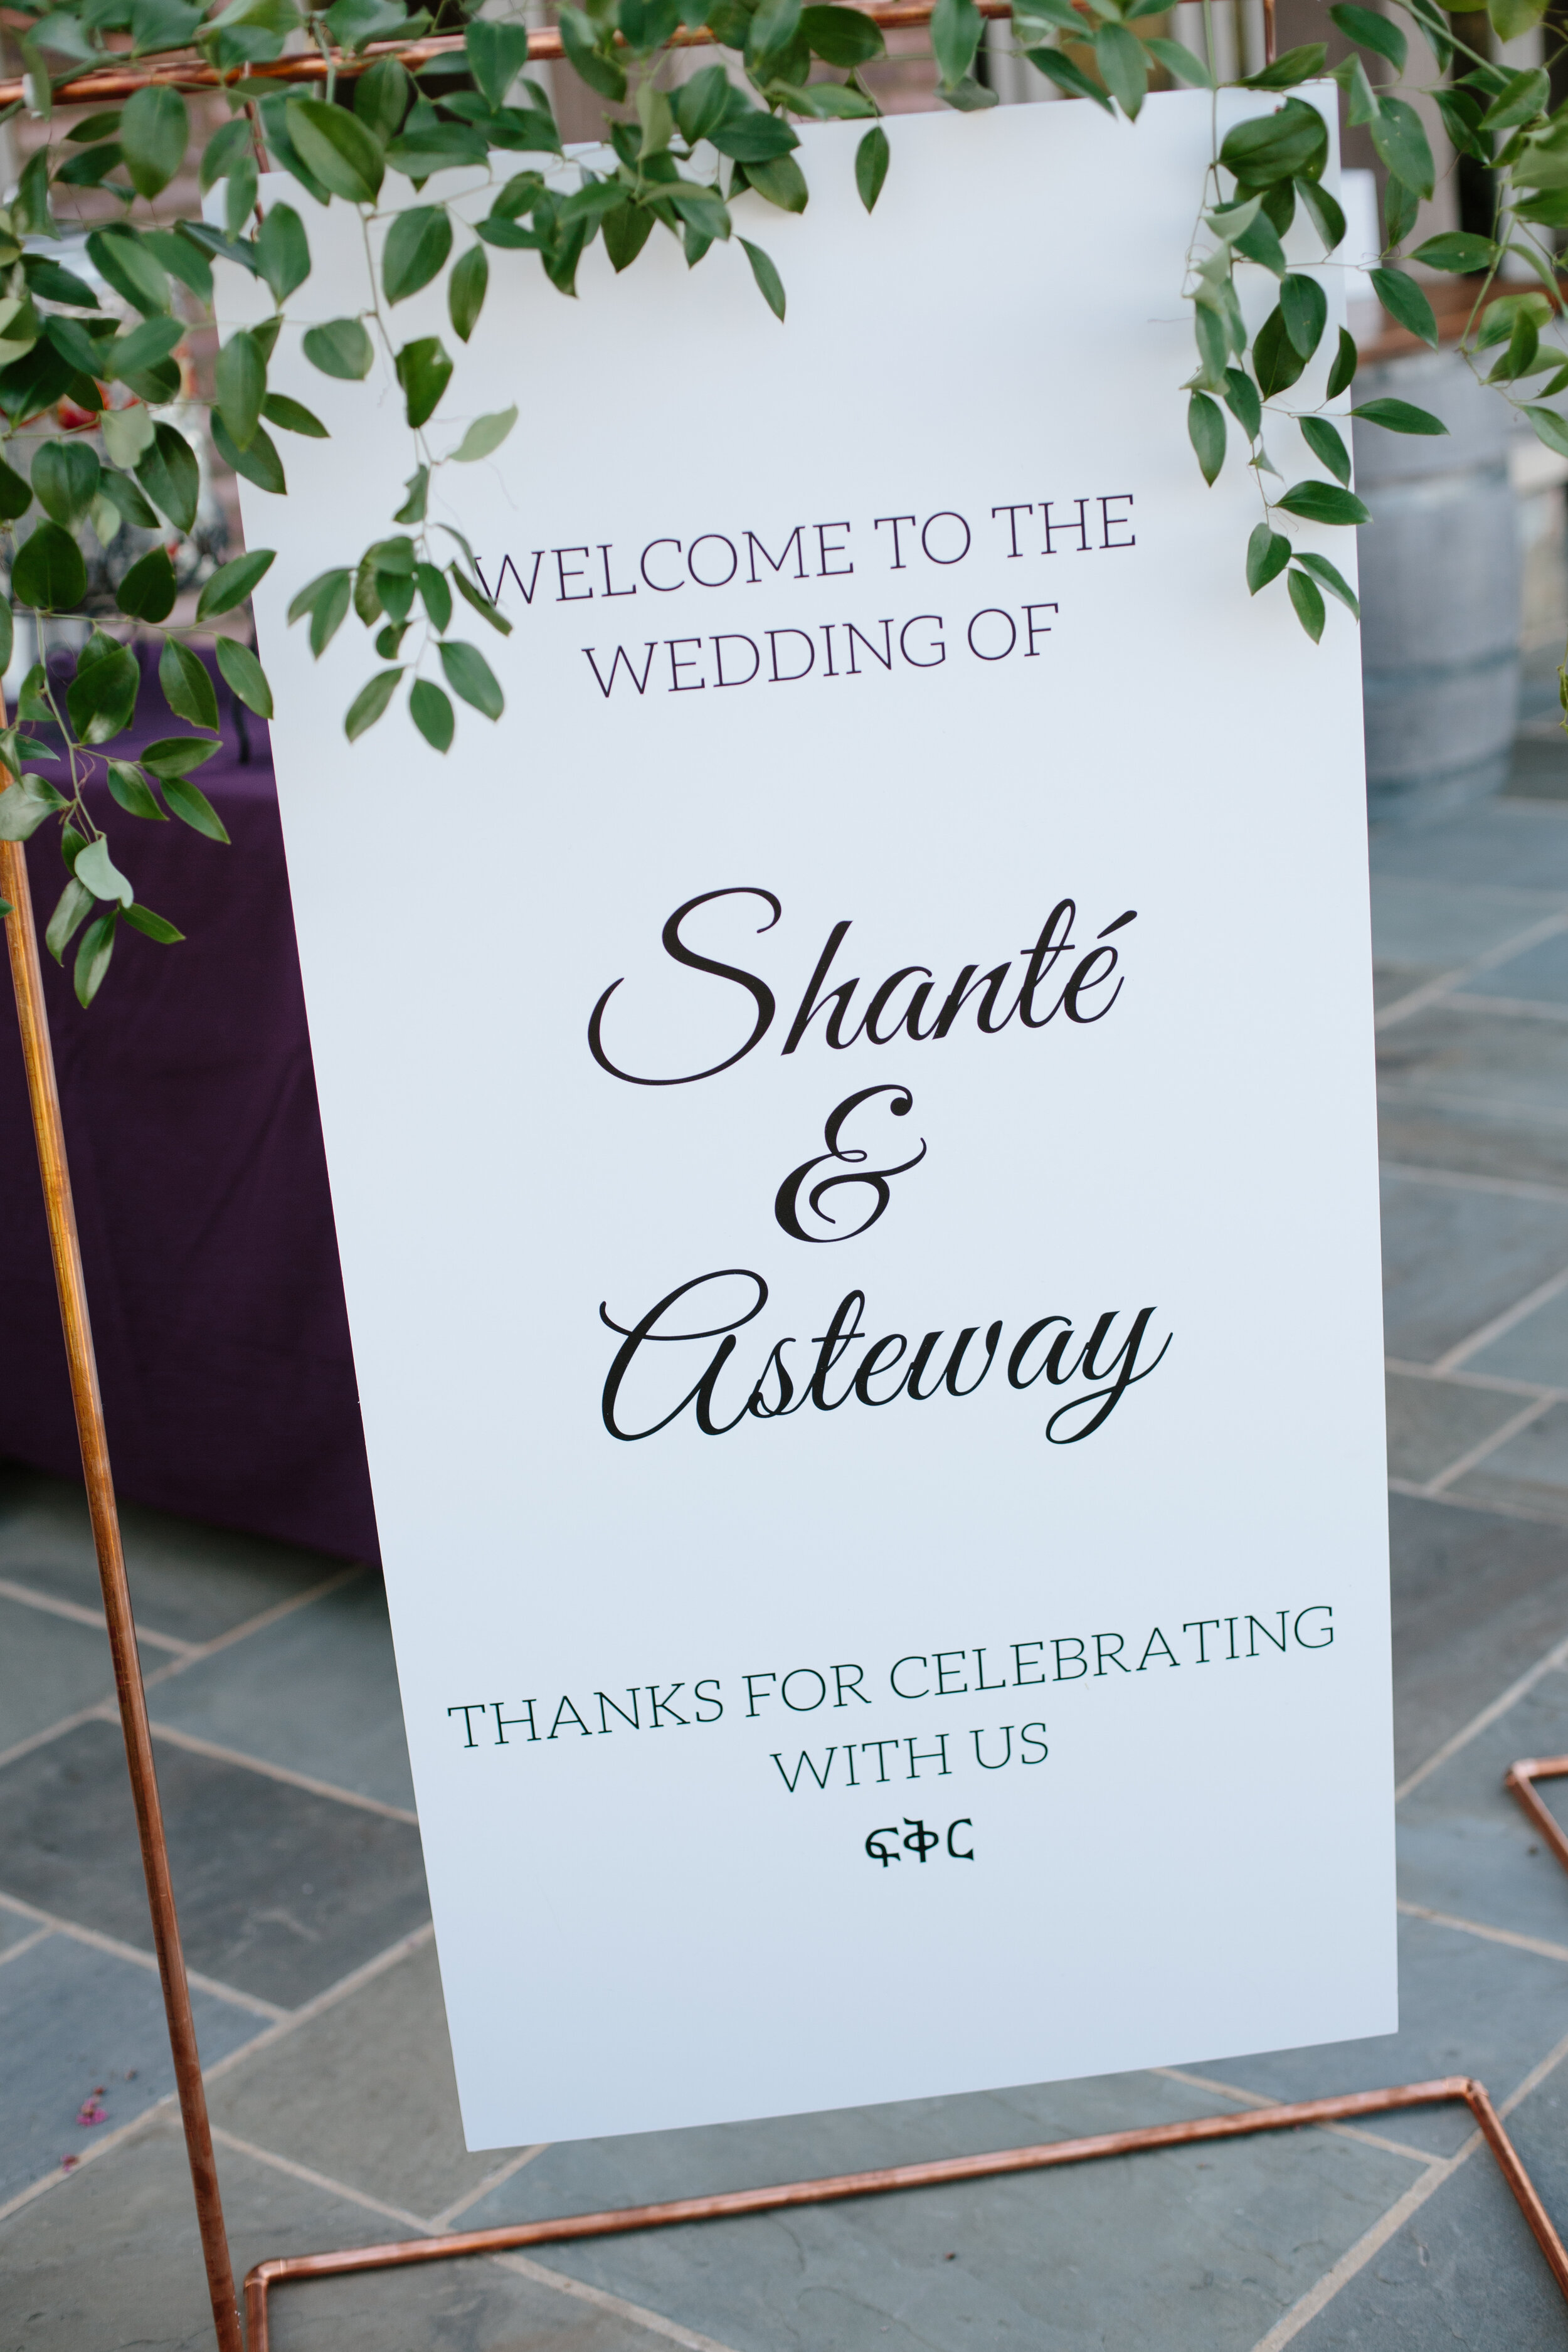 Shante-Asteway-Wedding-Andrew-Roby-Events-5.jpg..jpg